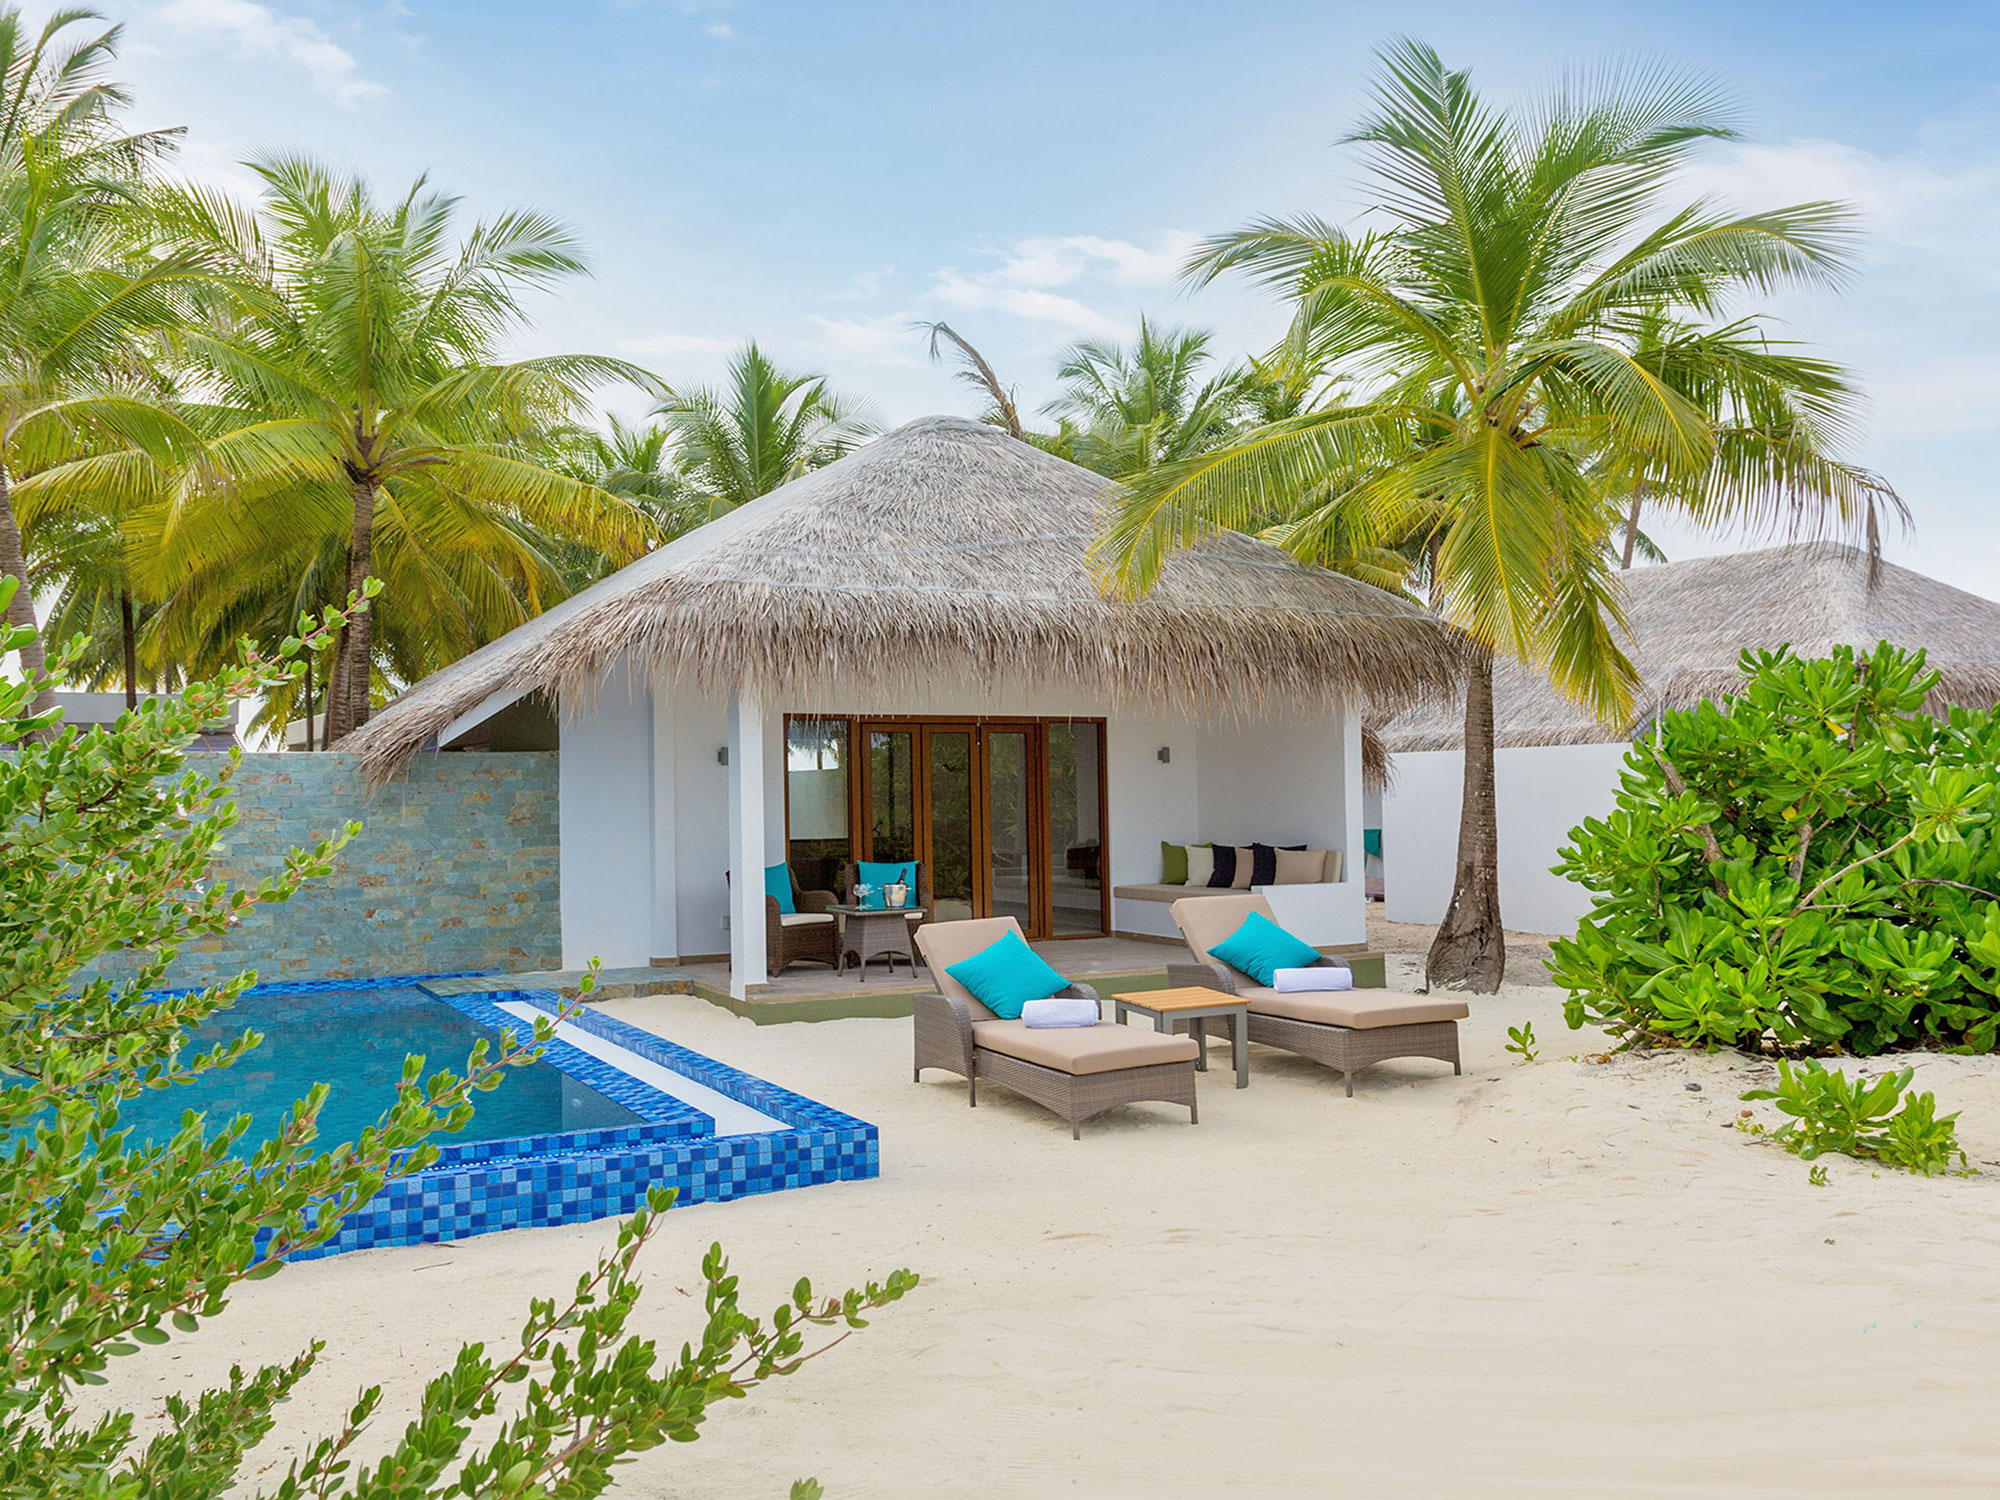 beach-suite-with-pool.jpg